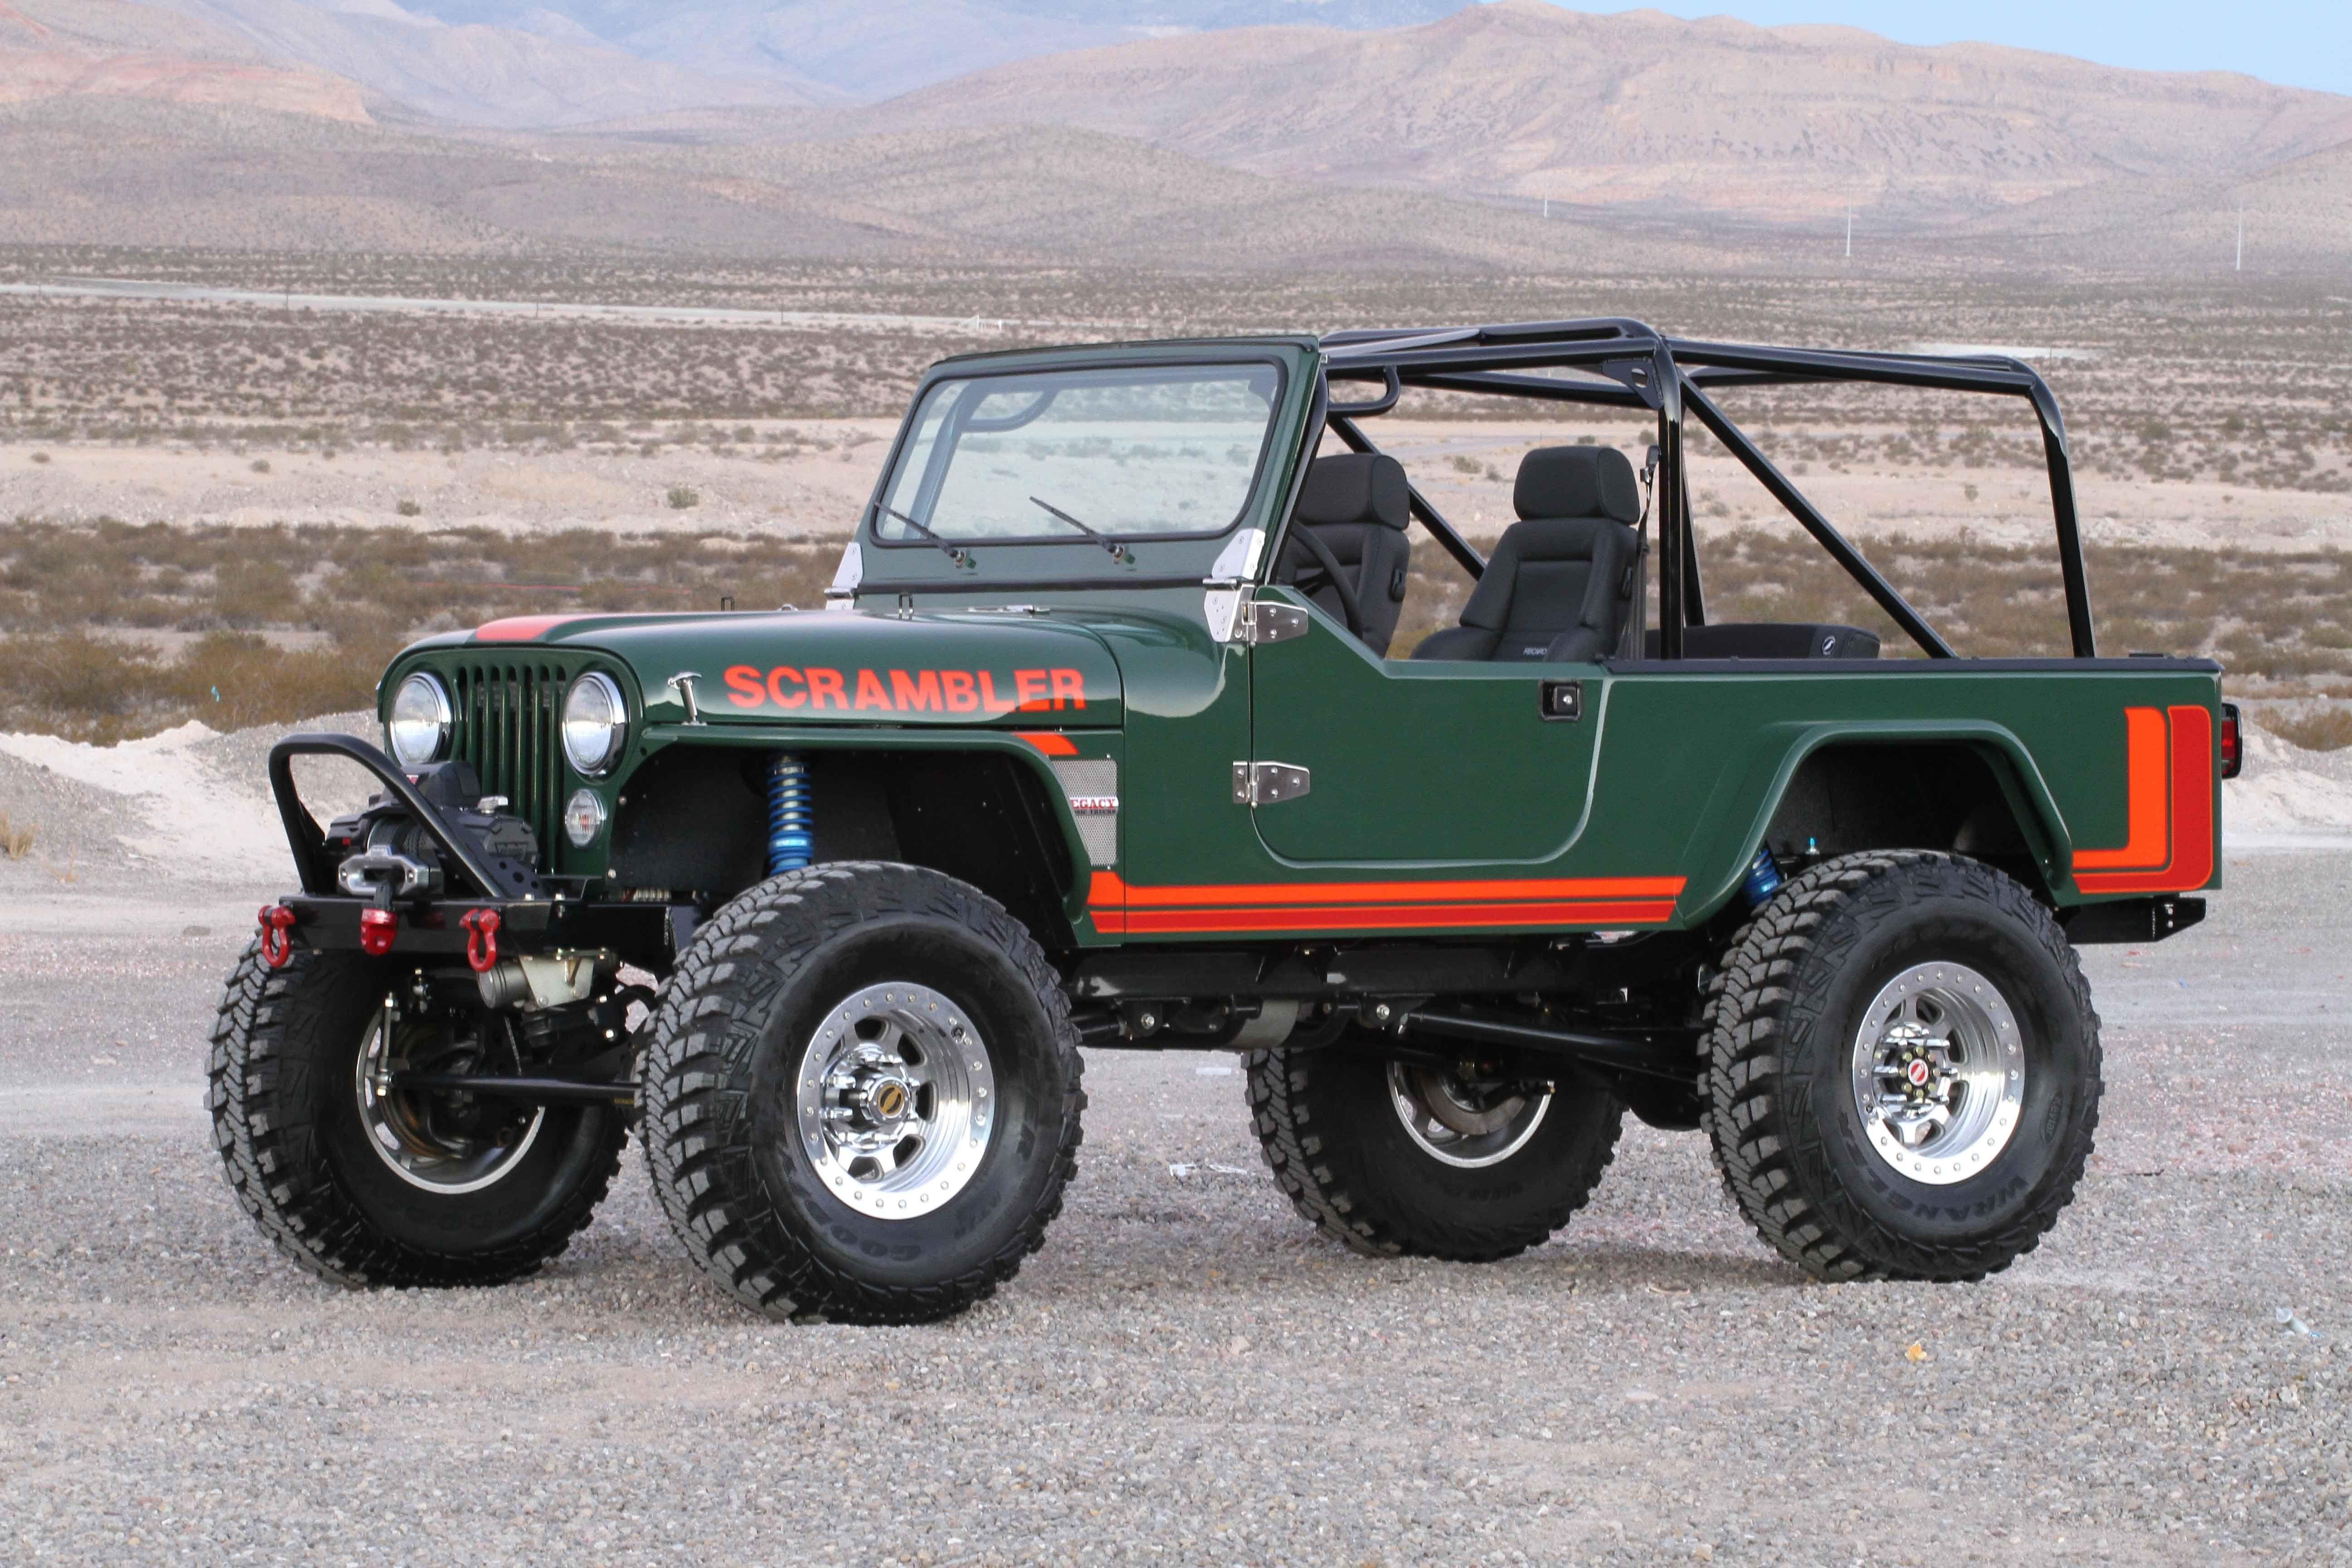 1983 jeep cj 8 scrambler jeep scrambler pinterest jeep cj scrambler and jeeps